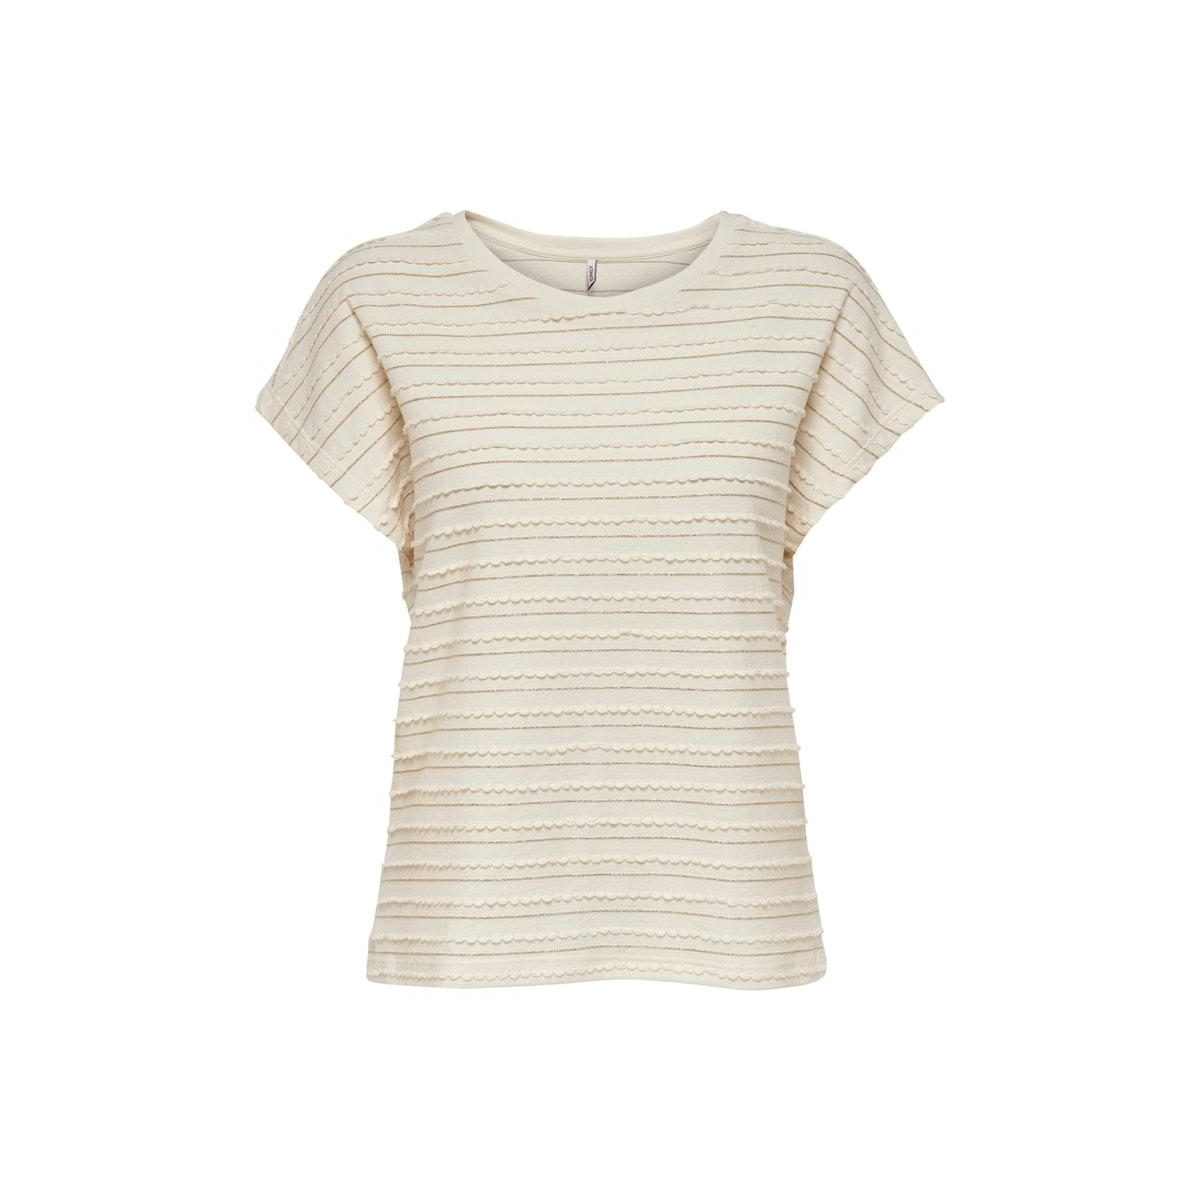 onlmillie s/s glitter top jrs 15199160 only t-shirt cloud dancer